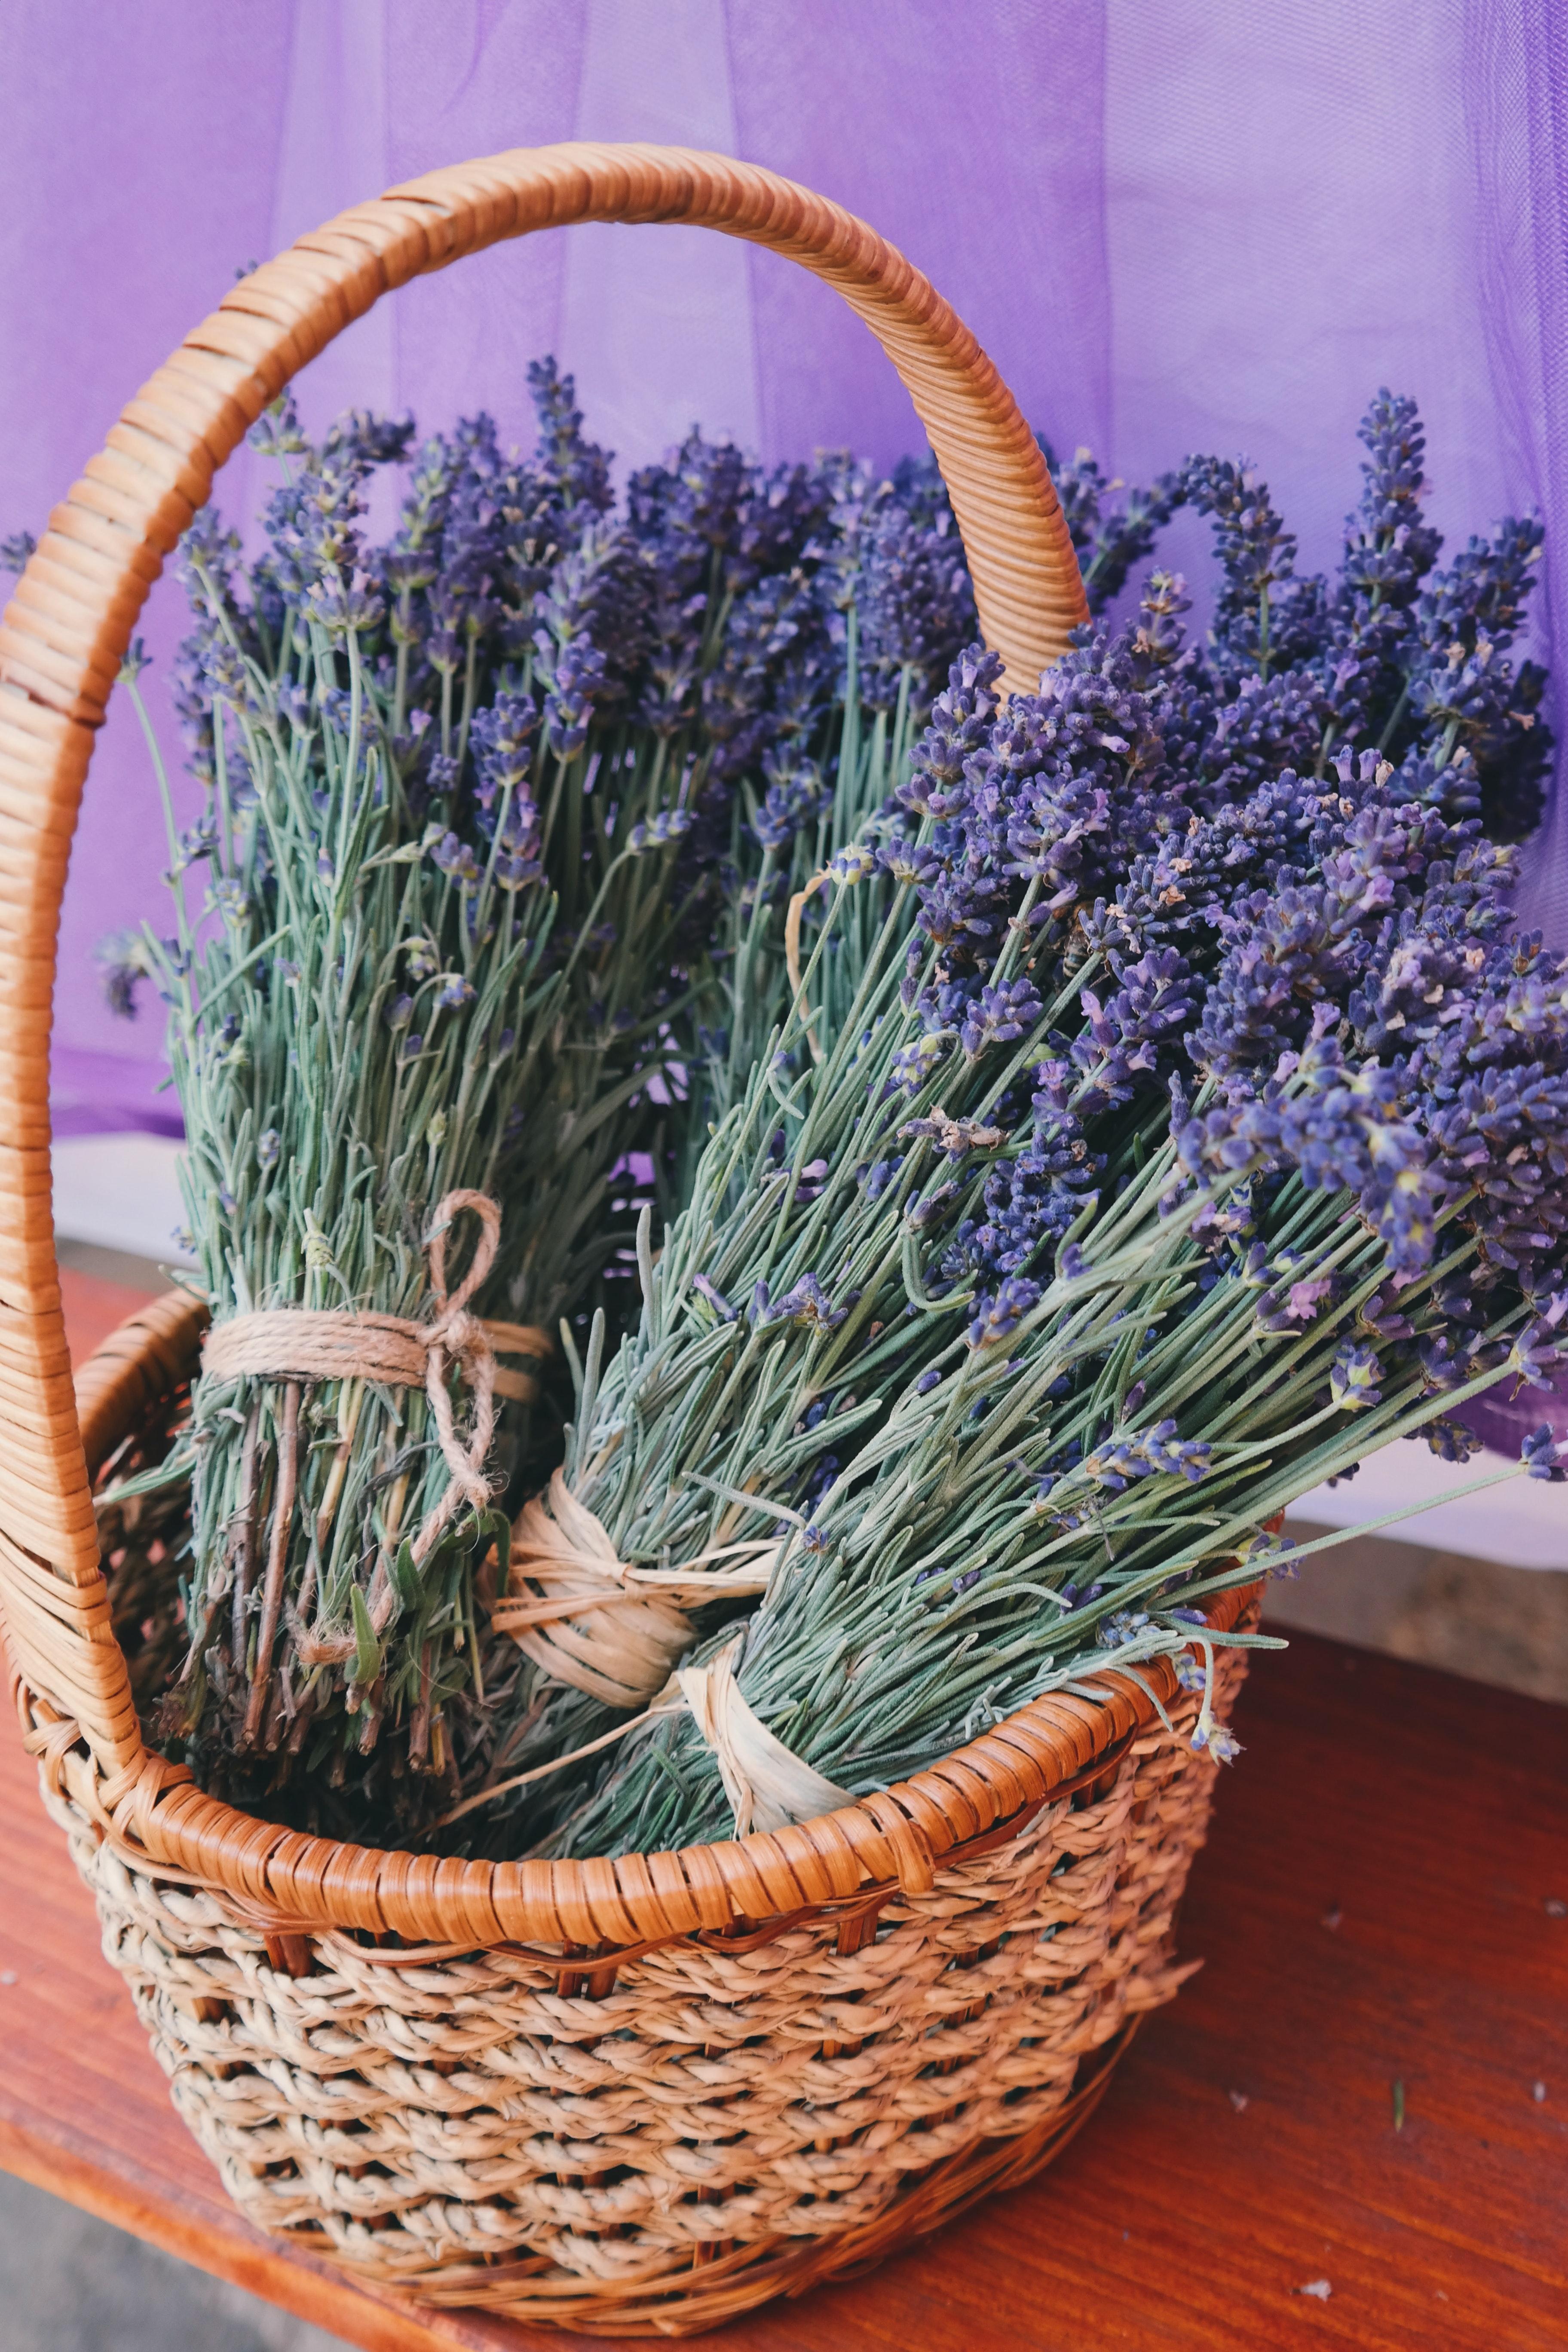 Free stock photo of aroma basket beautiful flowers free download izmirmasajfo